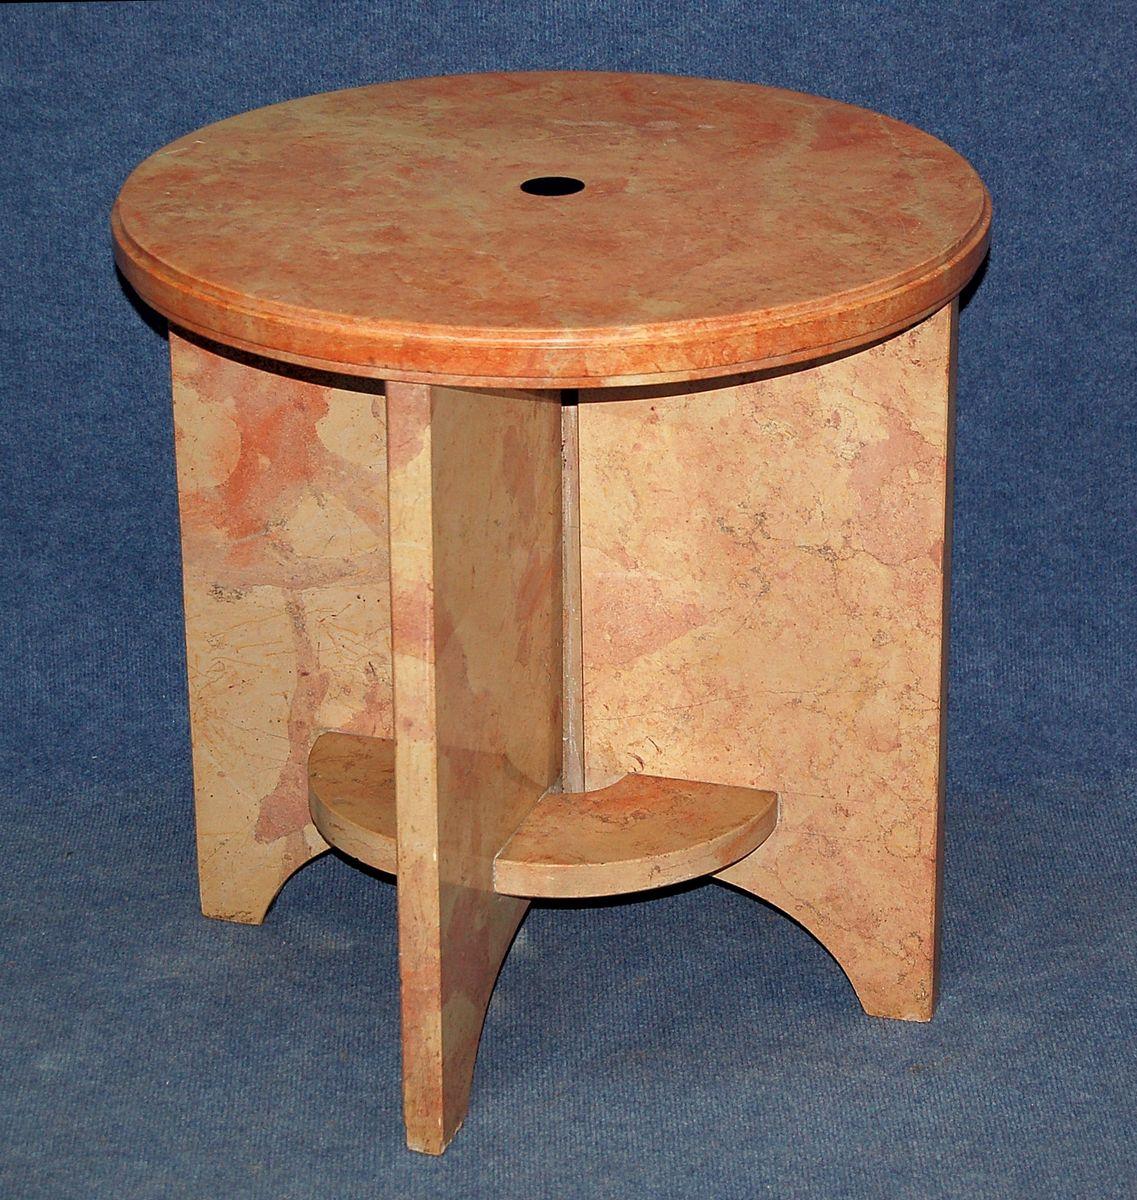 table d 39 appoint piedestal vintage en vente sur pamono. Black Bedroom Furniture Sets. Home Design Ideas